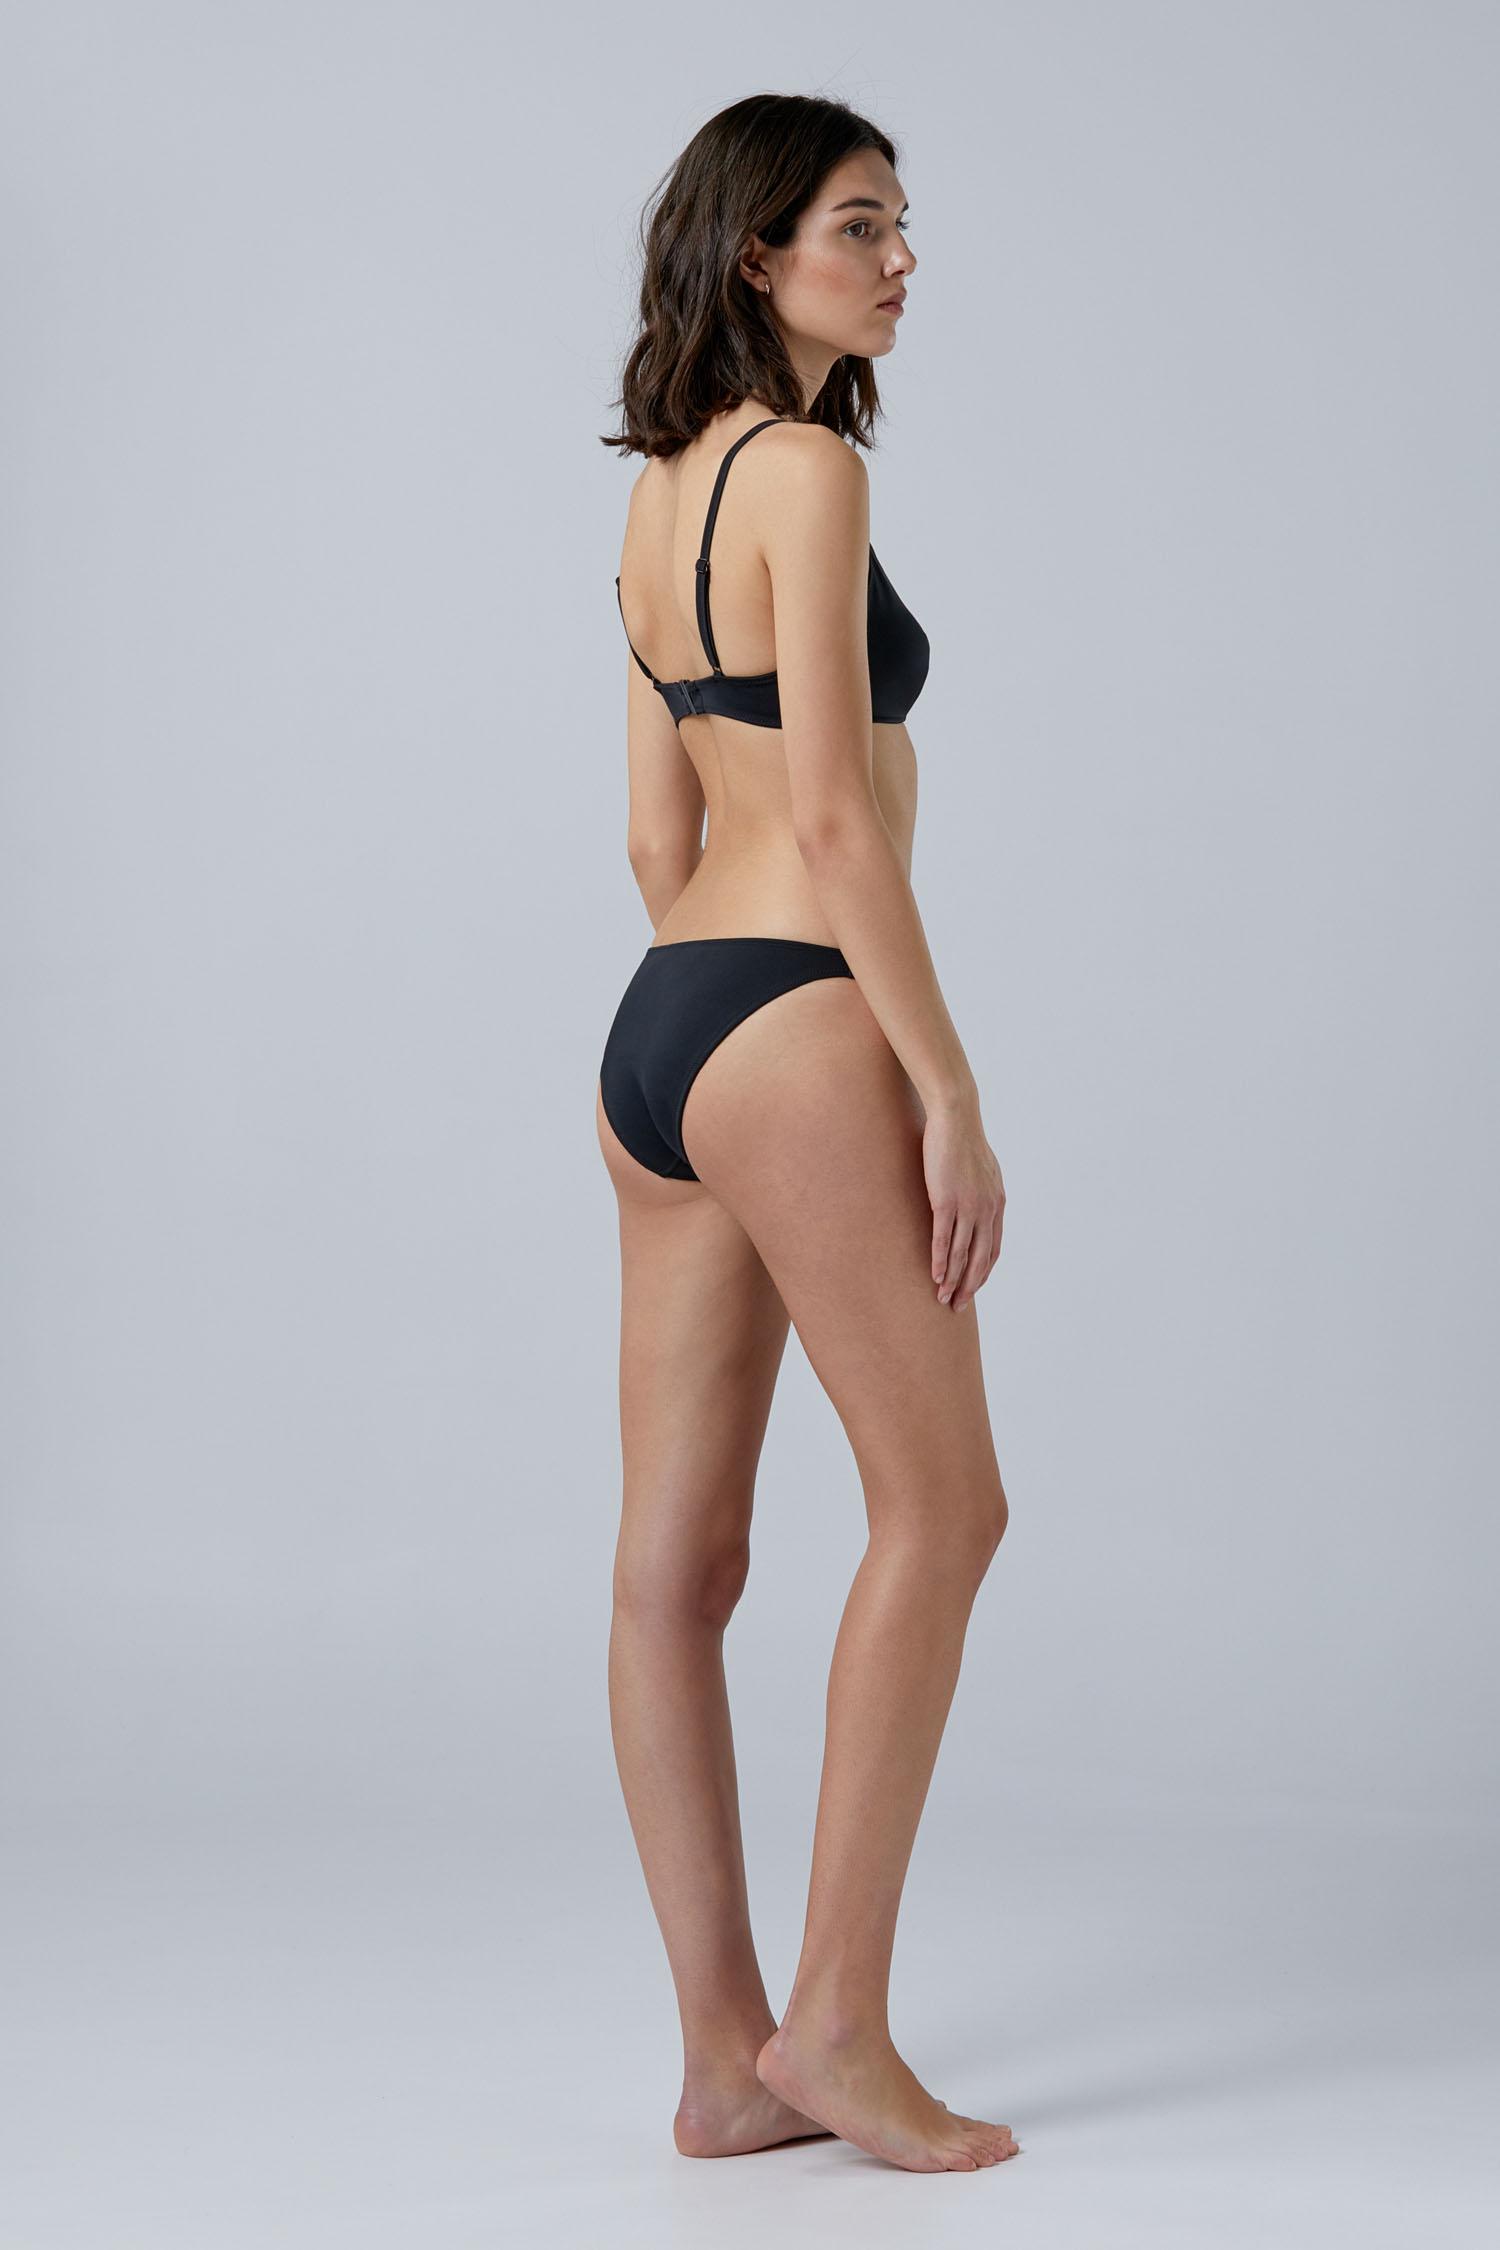 NIJIMA + BANTAYAN, by NOW_THEN eco swimwear / bikini ecológico